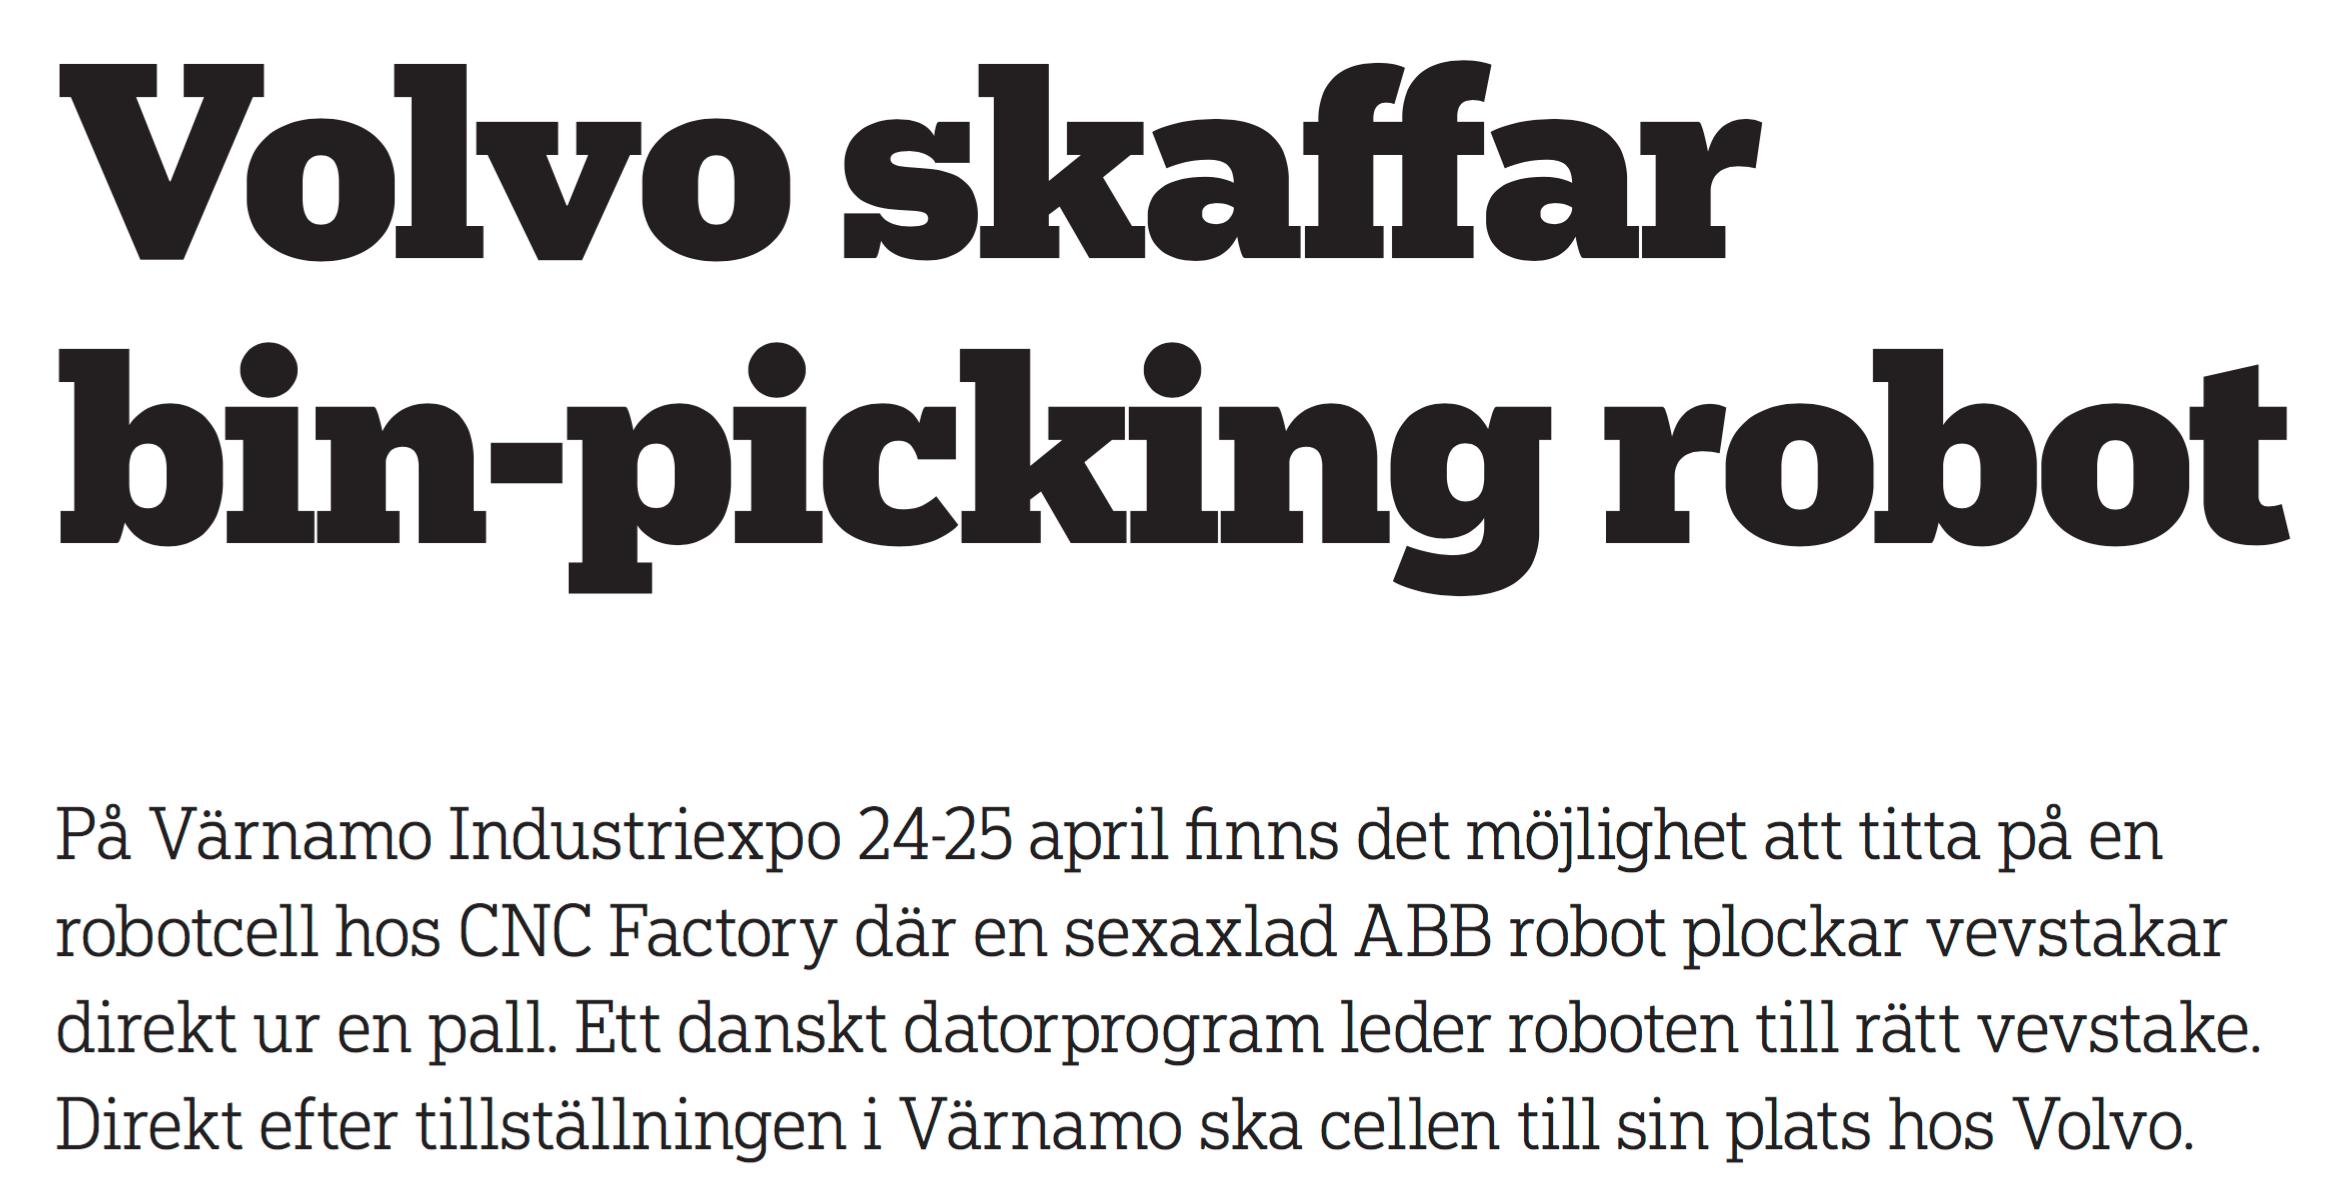 Volvo skaffar bin-picking robot